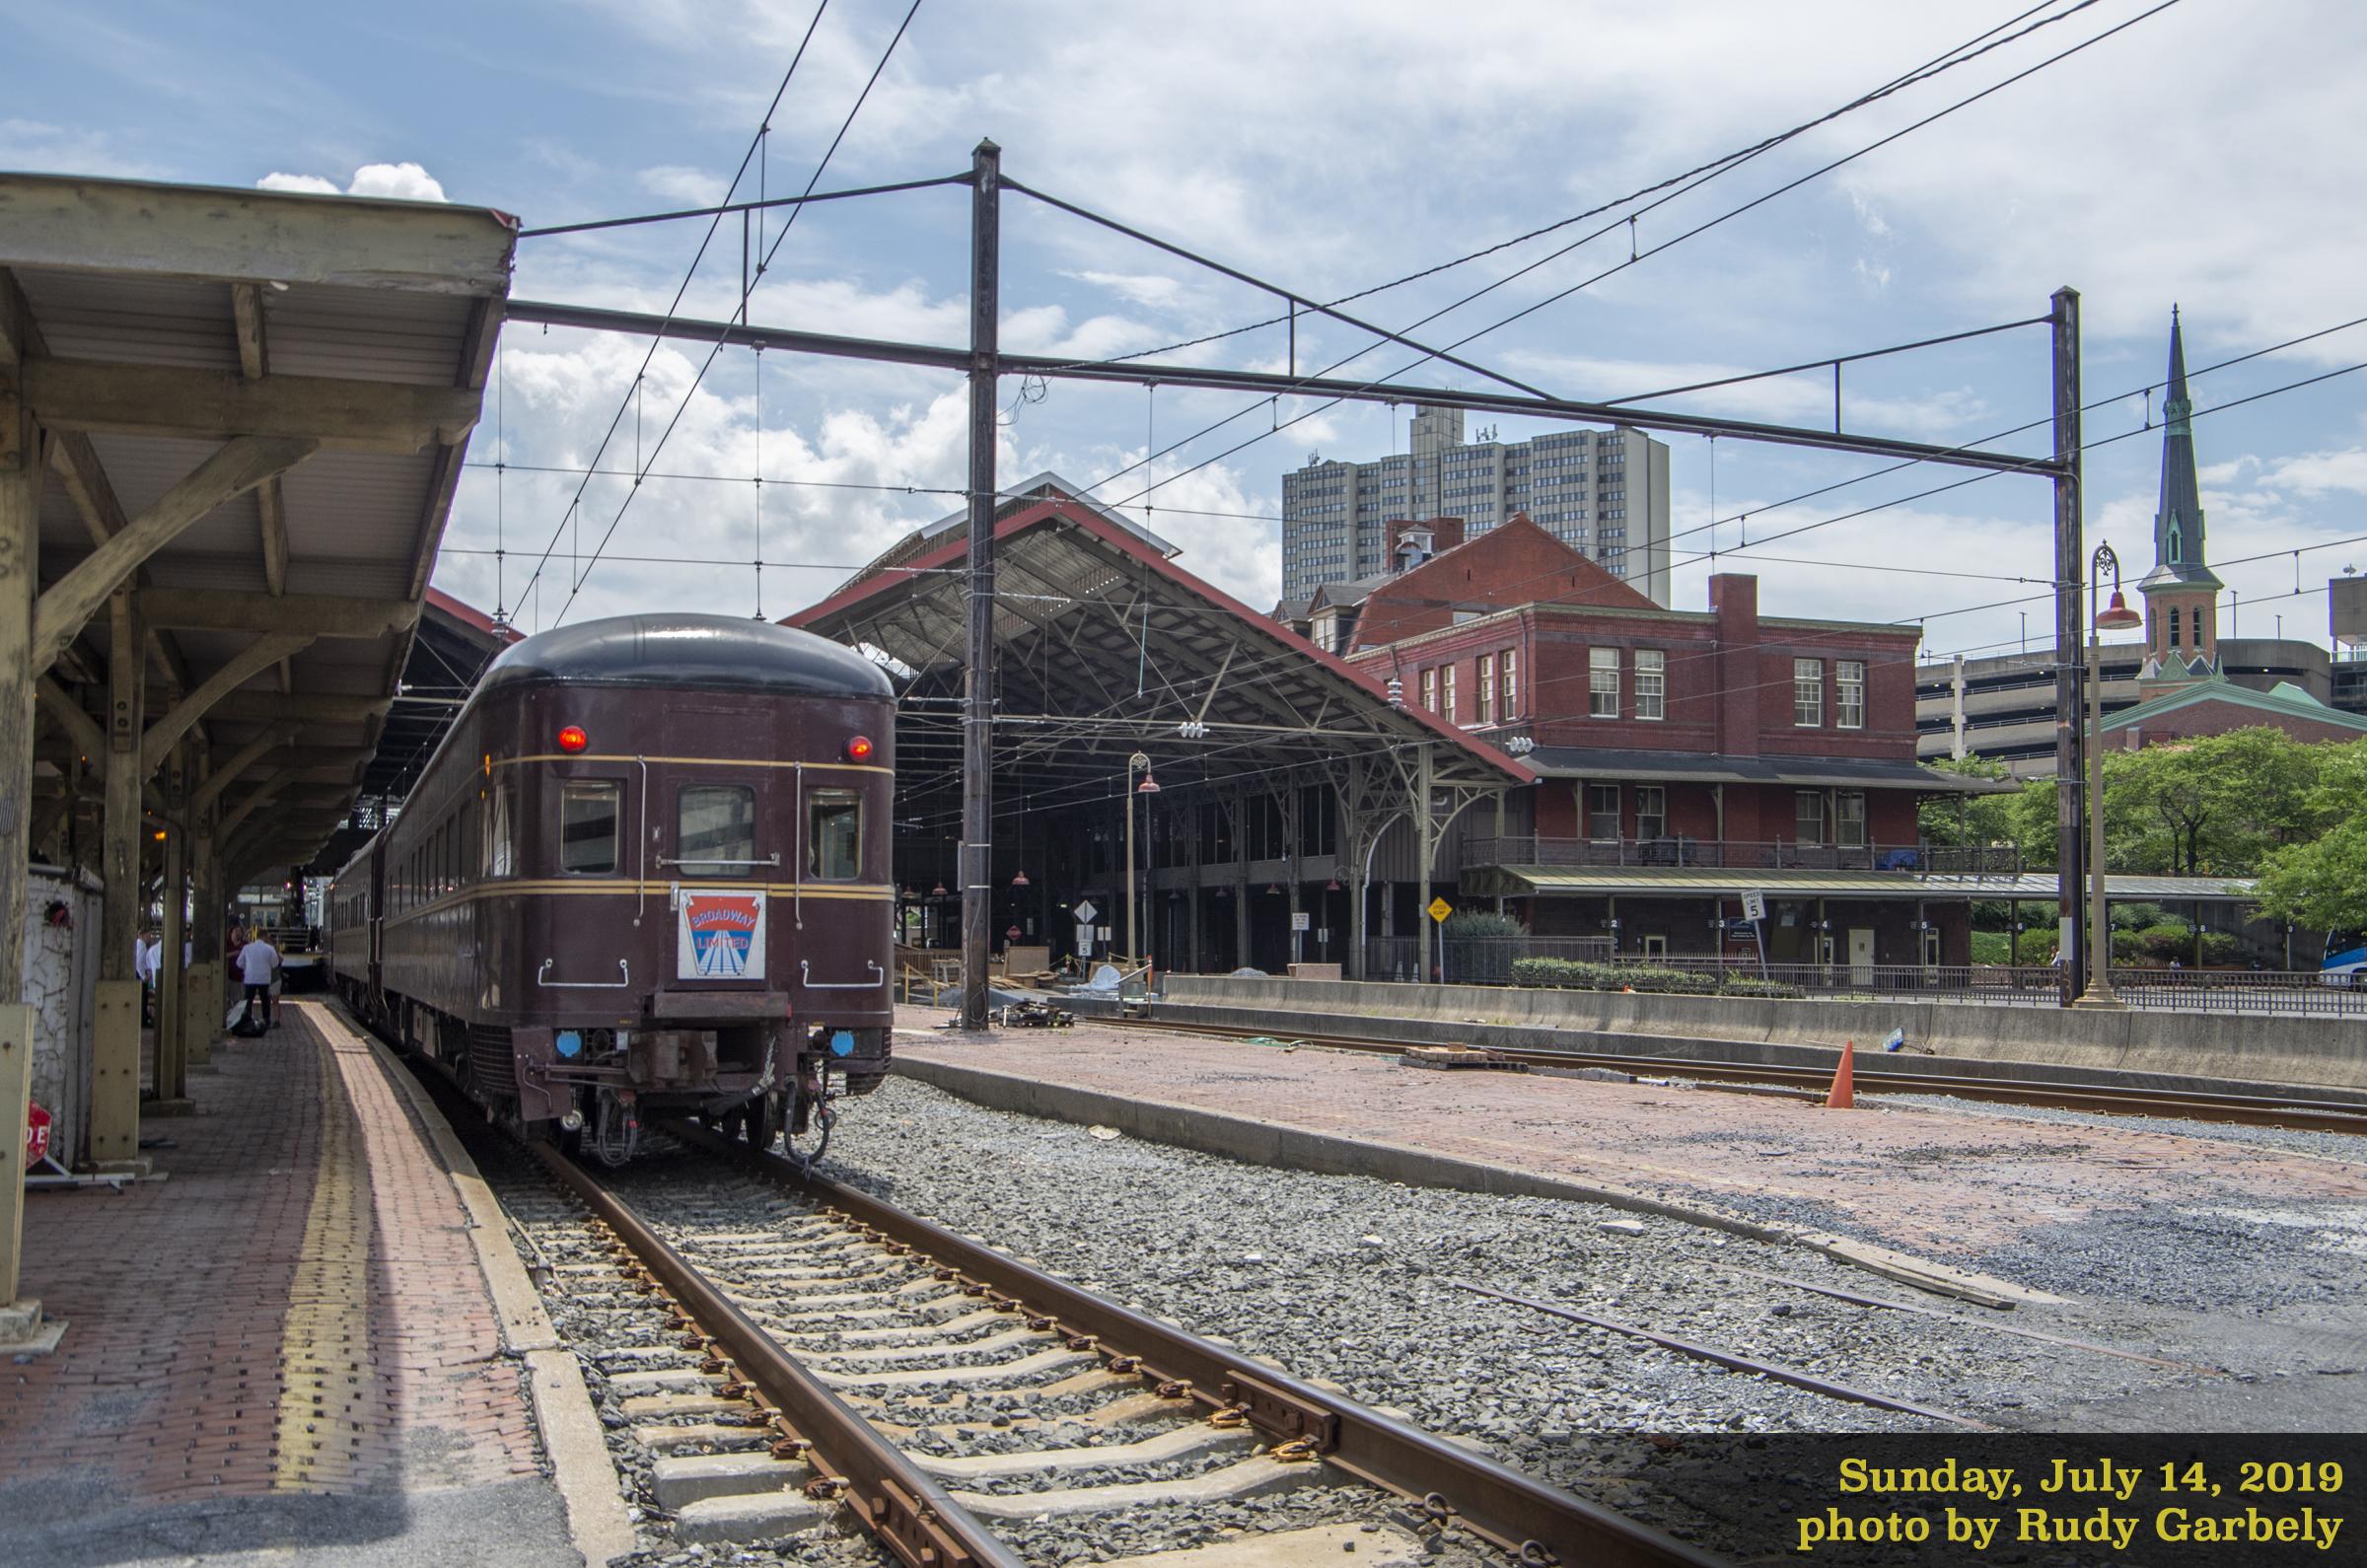 2019-07-14_06_PRR_8123_HarrisburgPA_RudyGarbely_mark.jpg